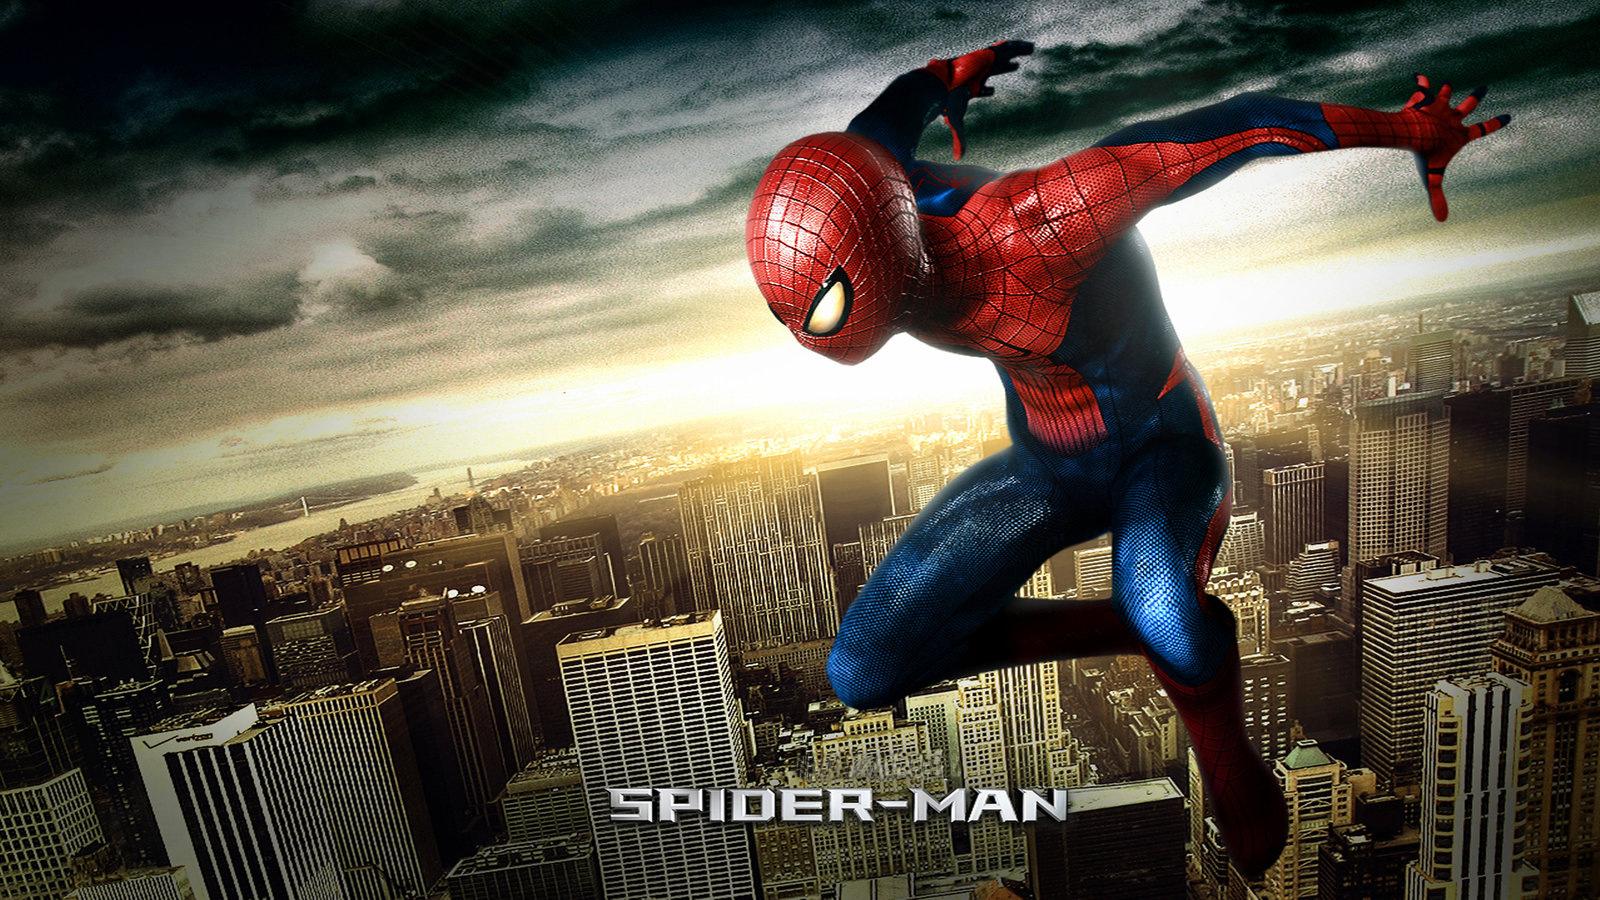 Most Inspiring Wallpaper Minecraft Superhero - Spider_Man_movies-259425  Snapshot_705370.jpg!d